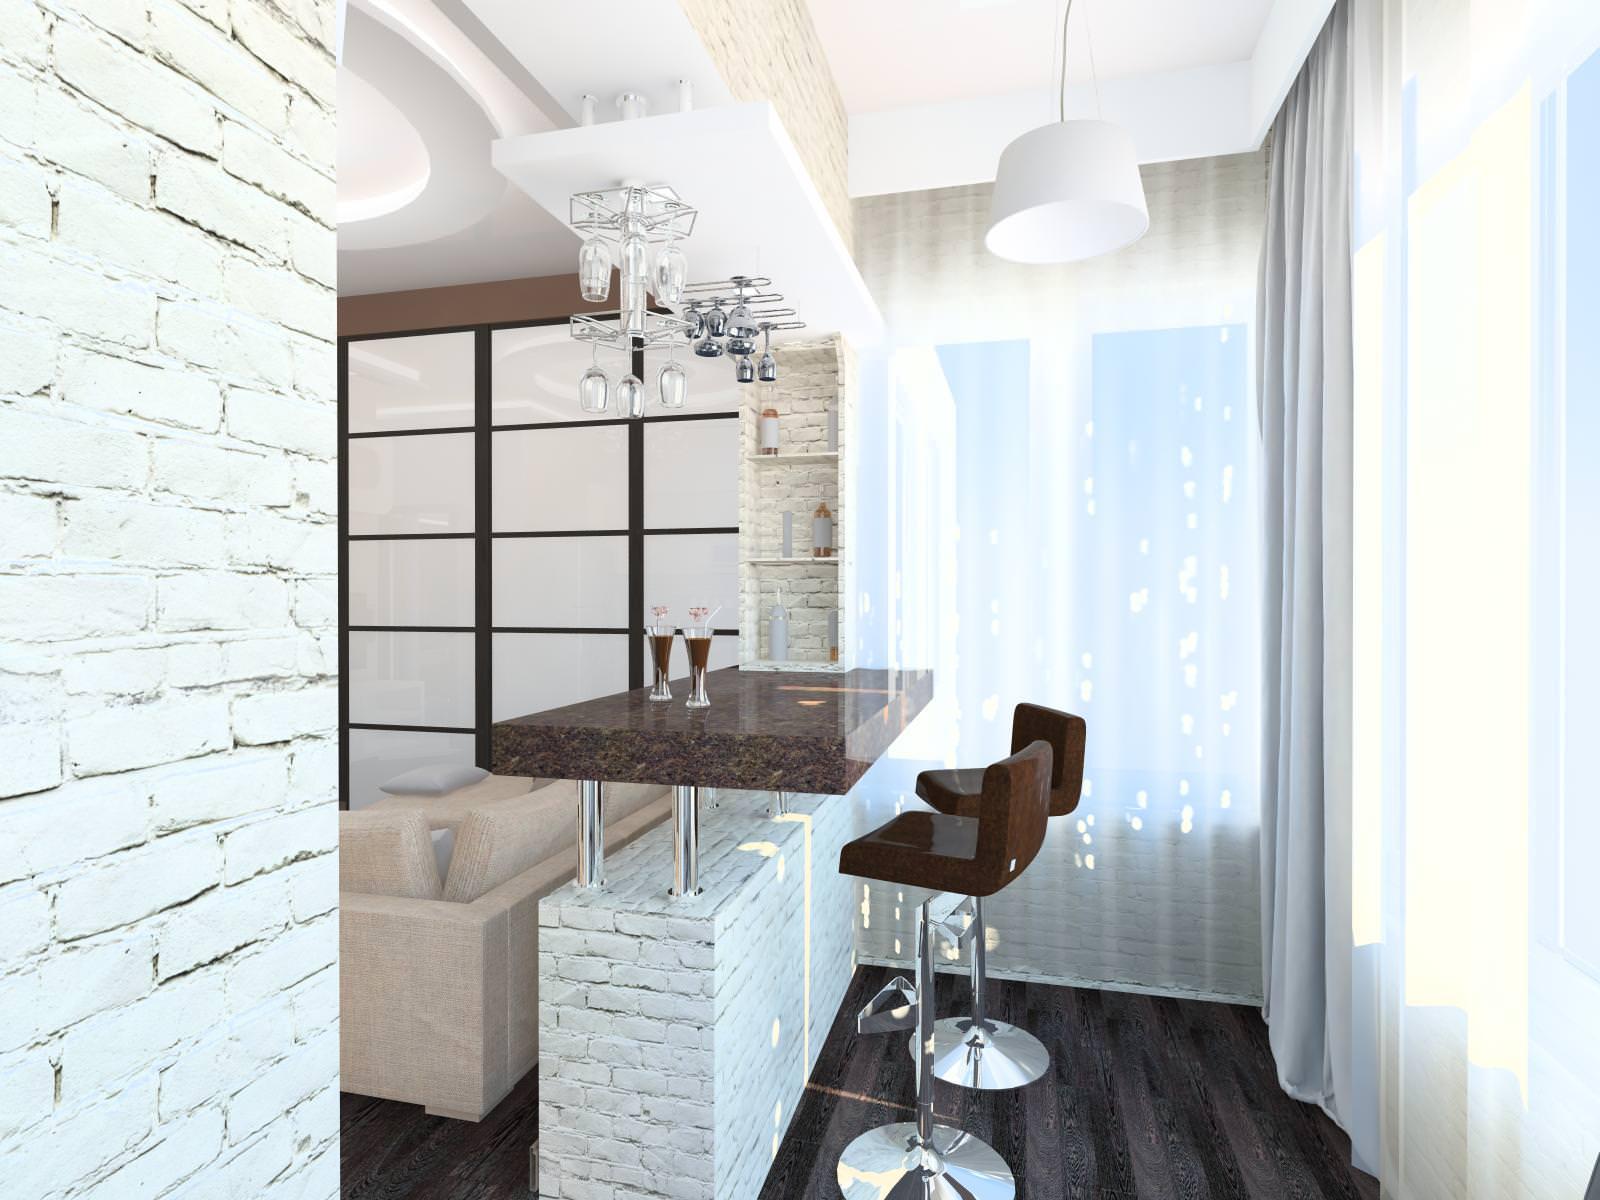 Расстановка мебели на кухне с балконом: дизайн кухни 11 и 10.